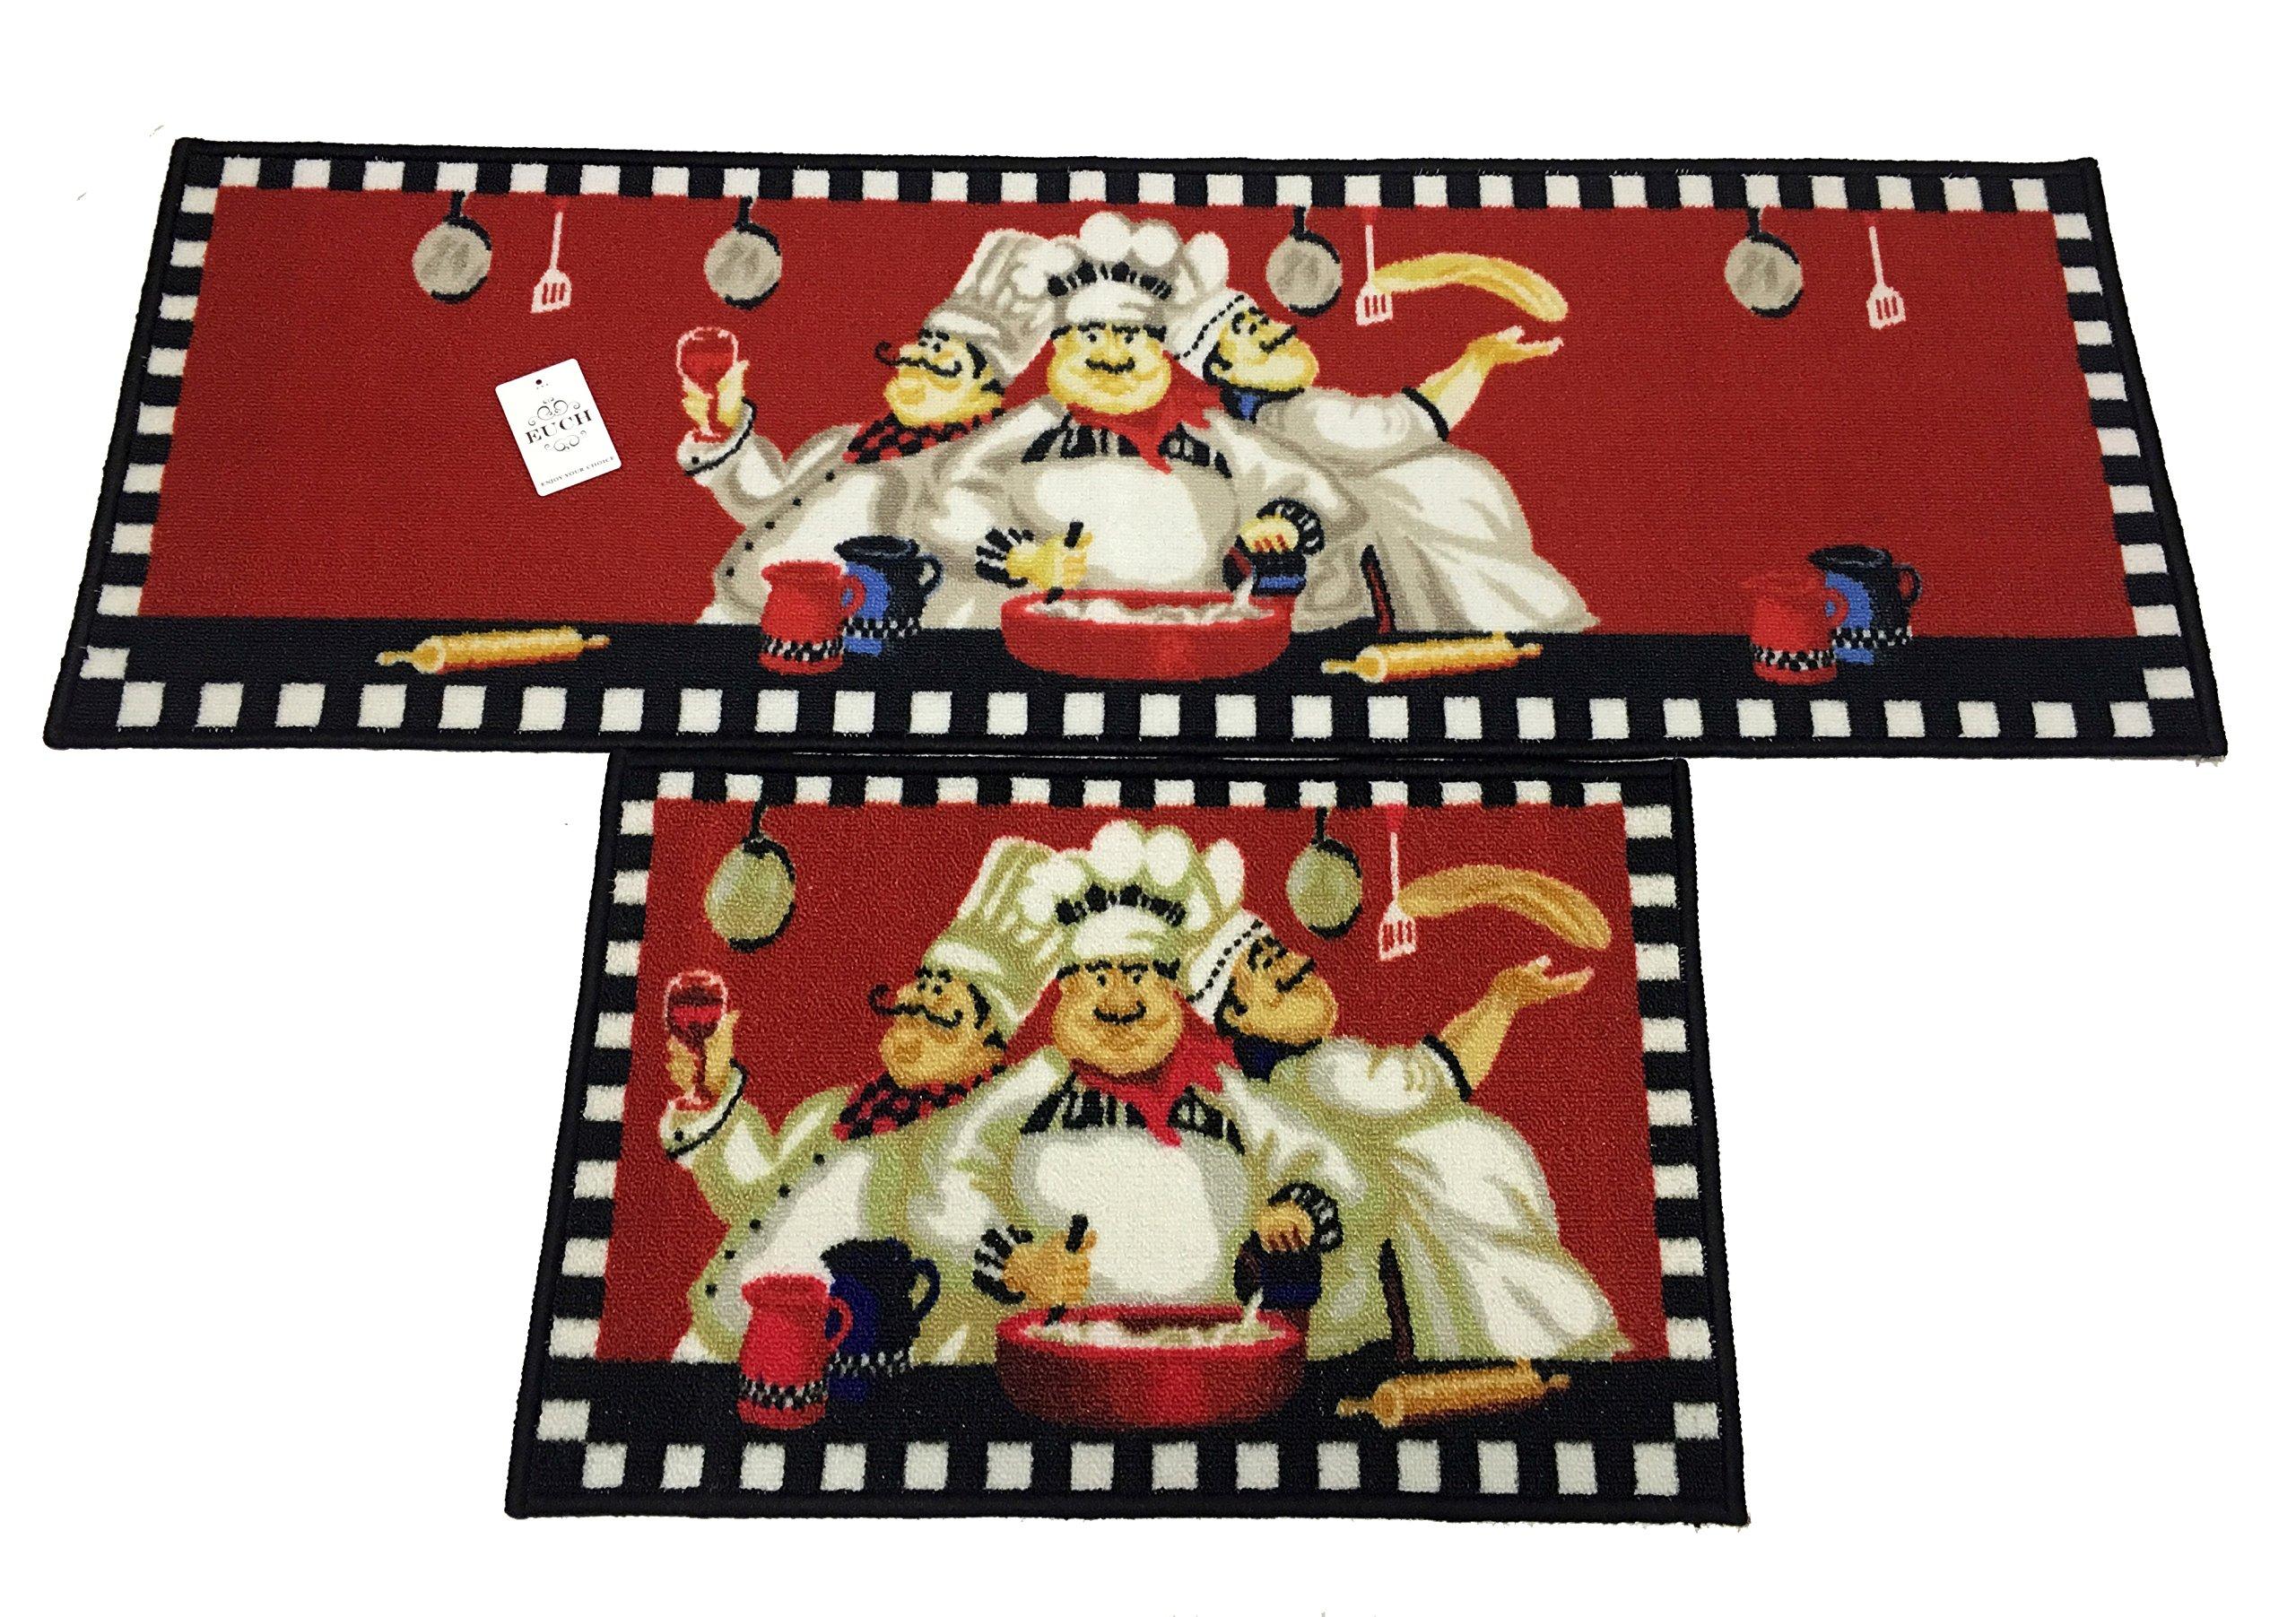 EUCH Non-slip Rubber Backing Carpet Kitchen Mat Doormat Runner Bathroom Rug 2 Piece Sets,15''x47''+15''x23'' (three chef) by EUCH (Image #2)